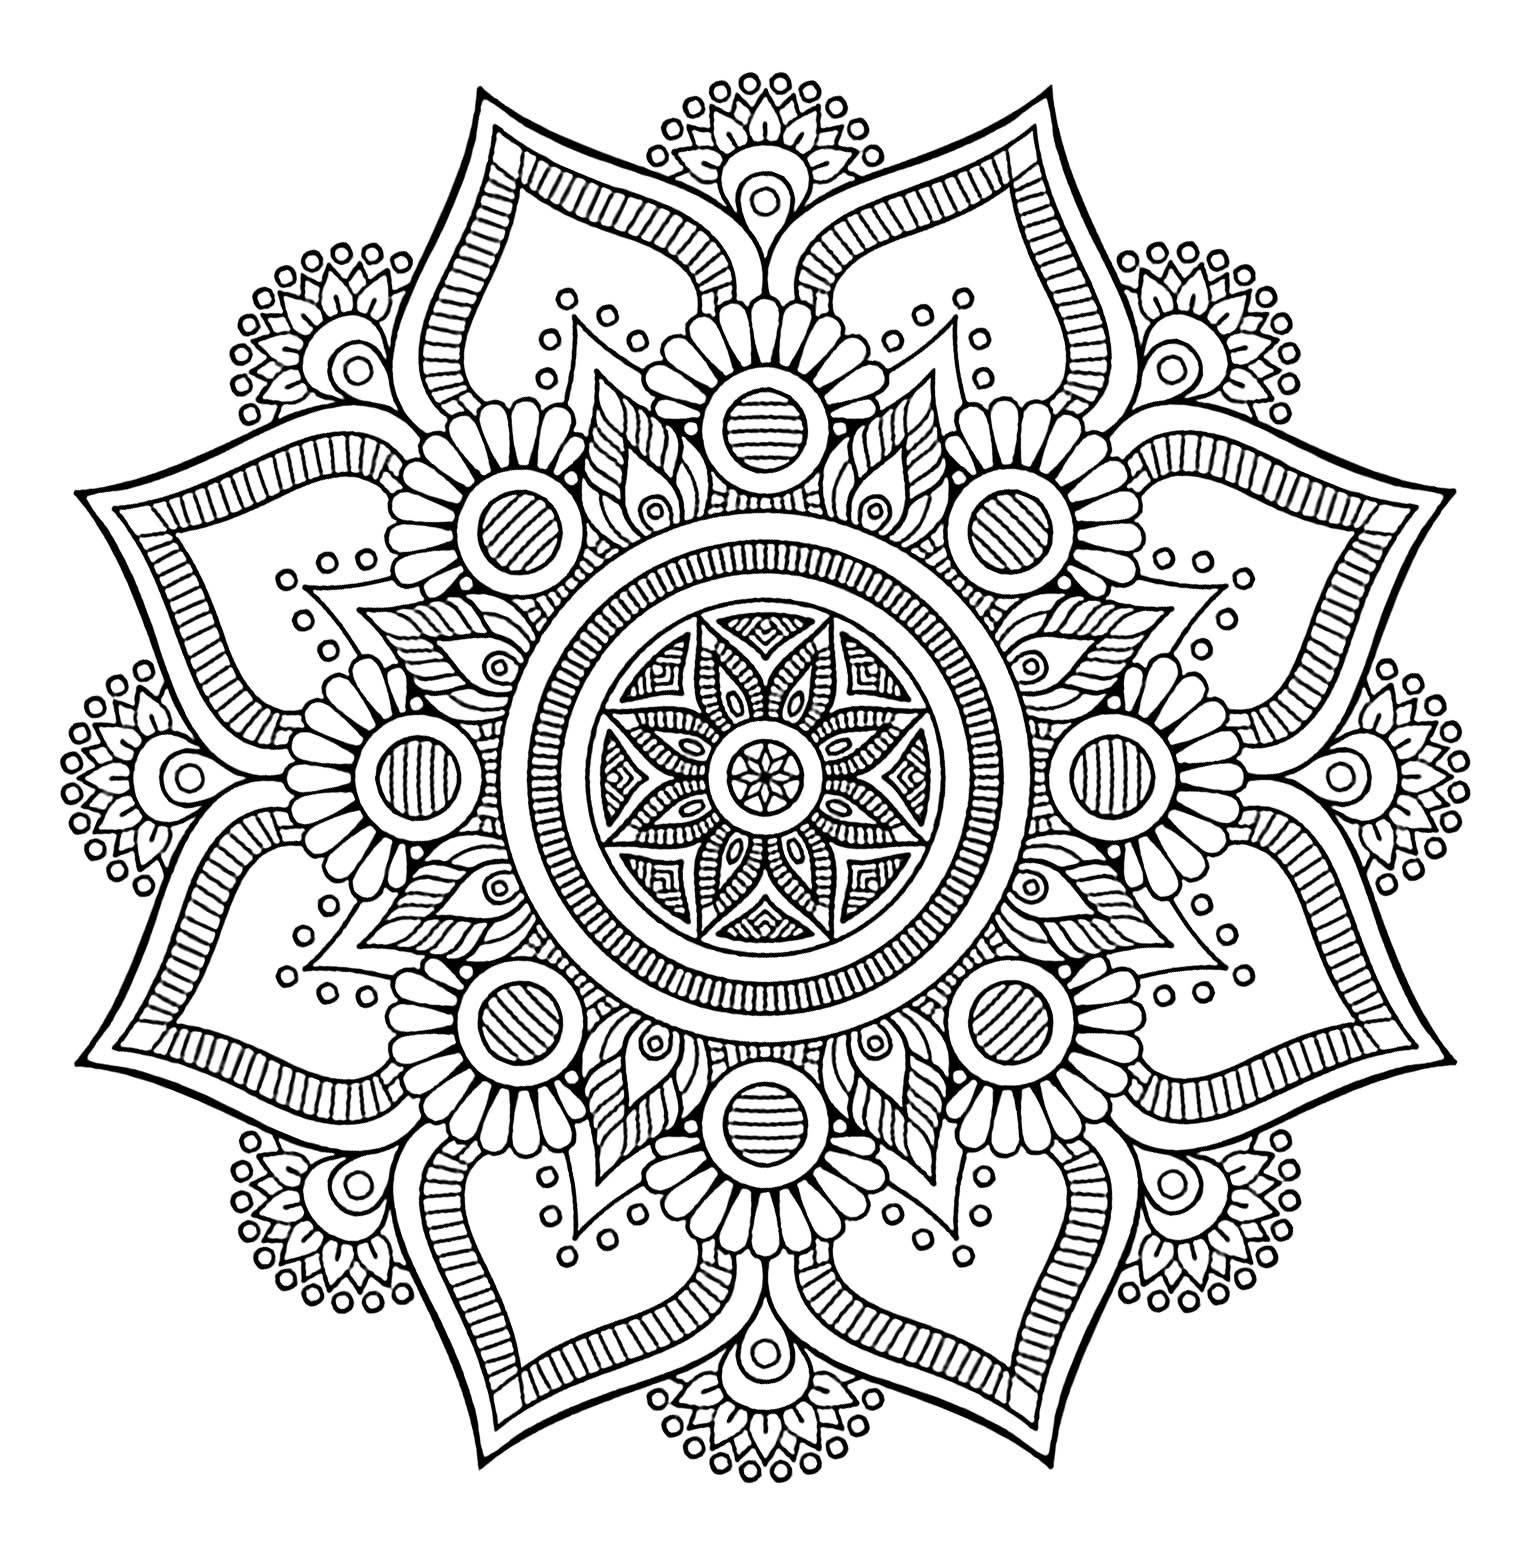 Cool Mandala With 8 Big Petals And Vegetal Patterns Mandala Coloring Mandala Coloring Pages Abstract Coloring Pages